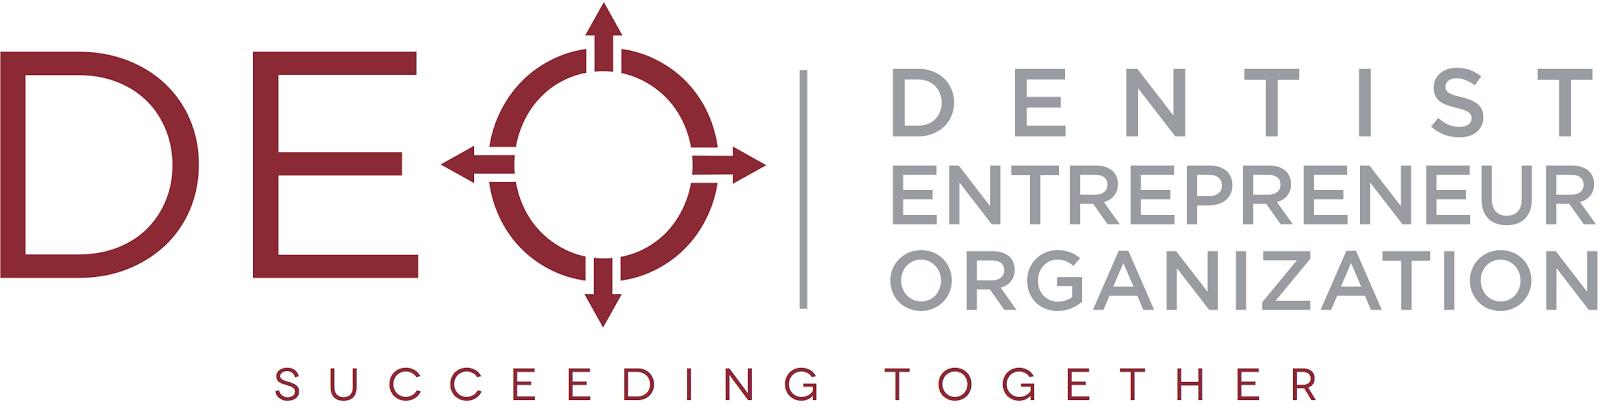 Dentist Entrepreneur Organization ...